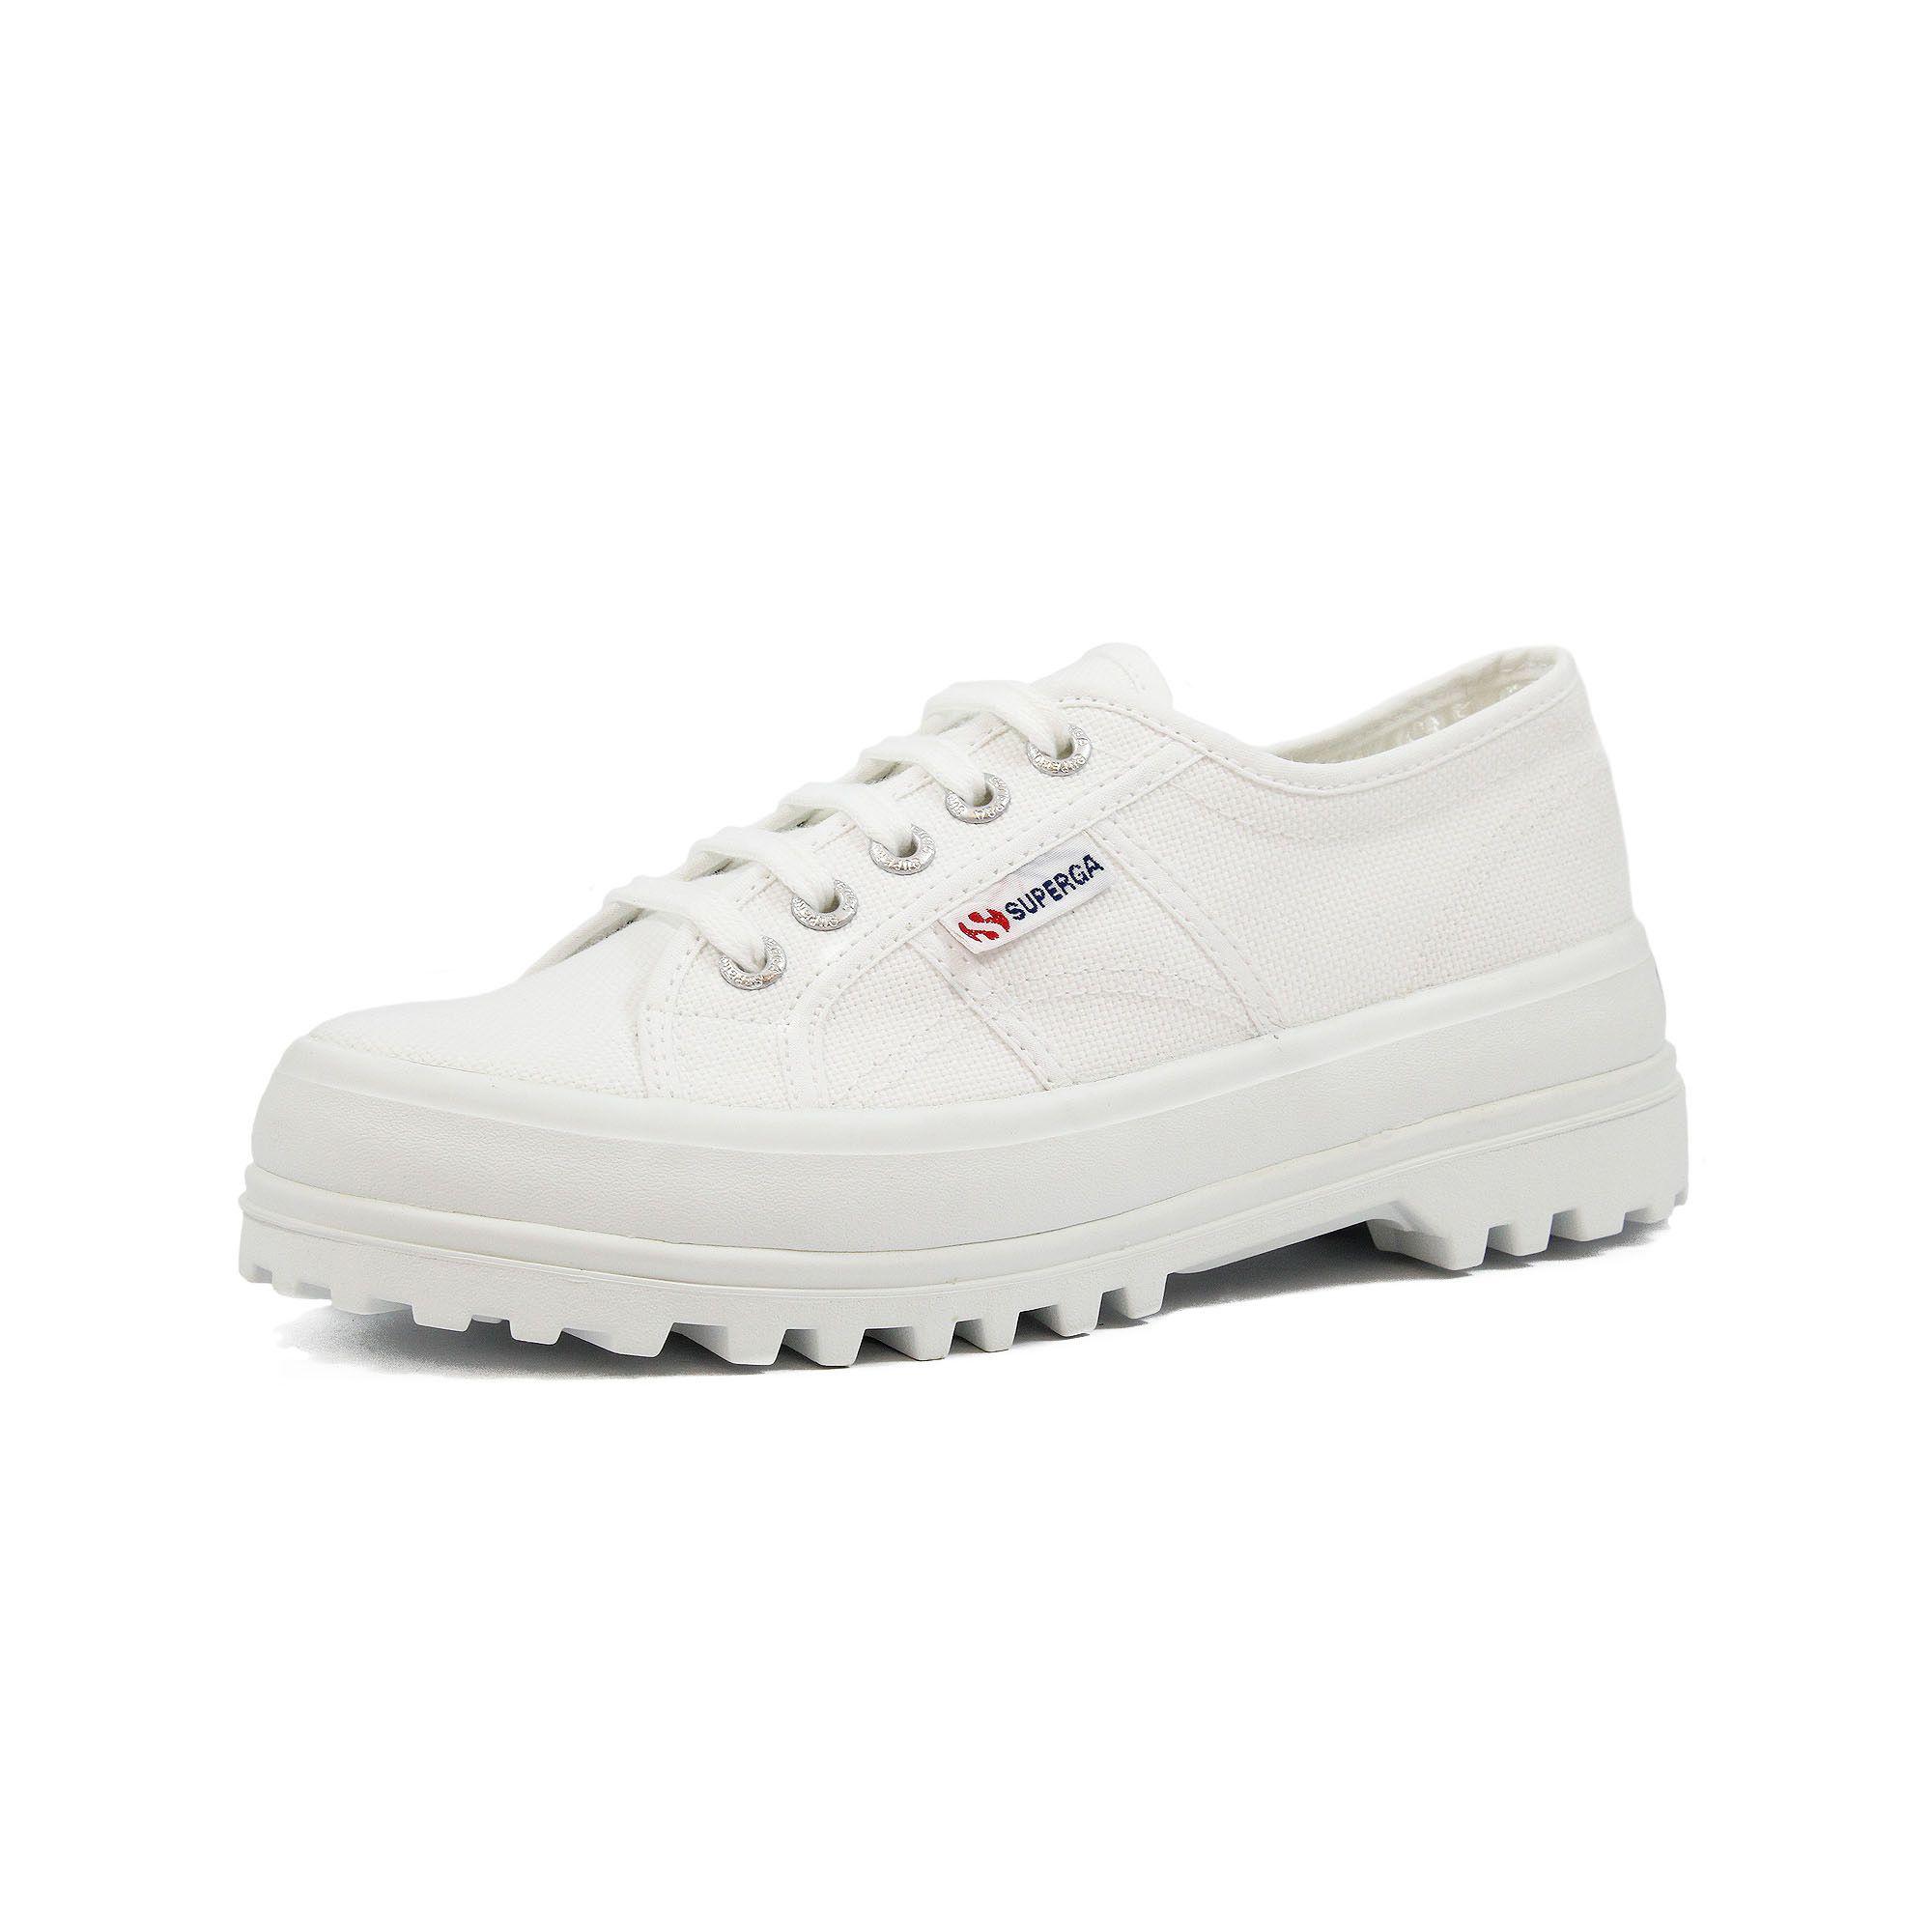 2555 COTU WHITE